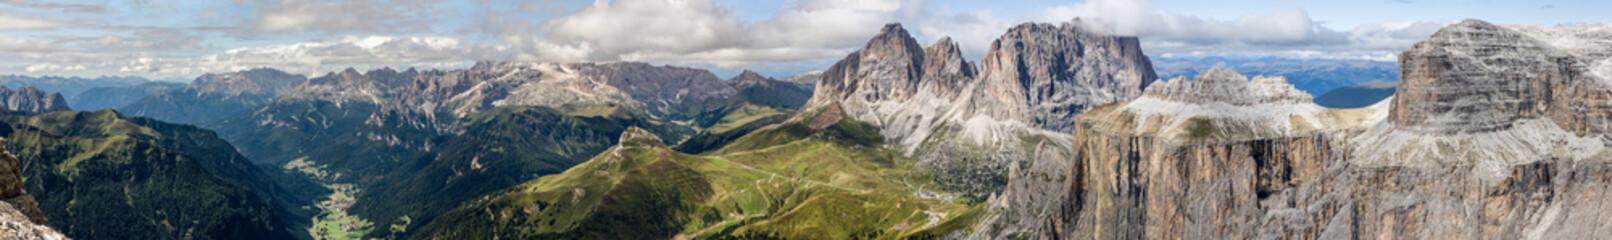 Dolomites Panorama